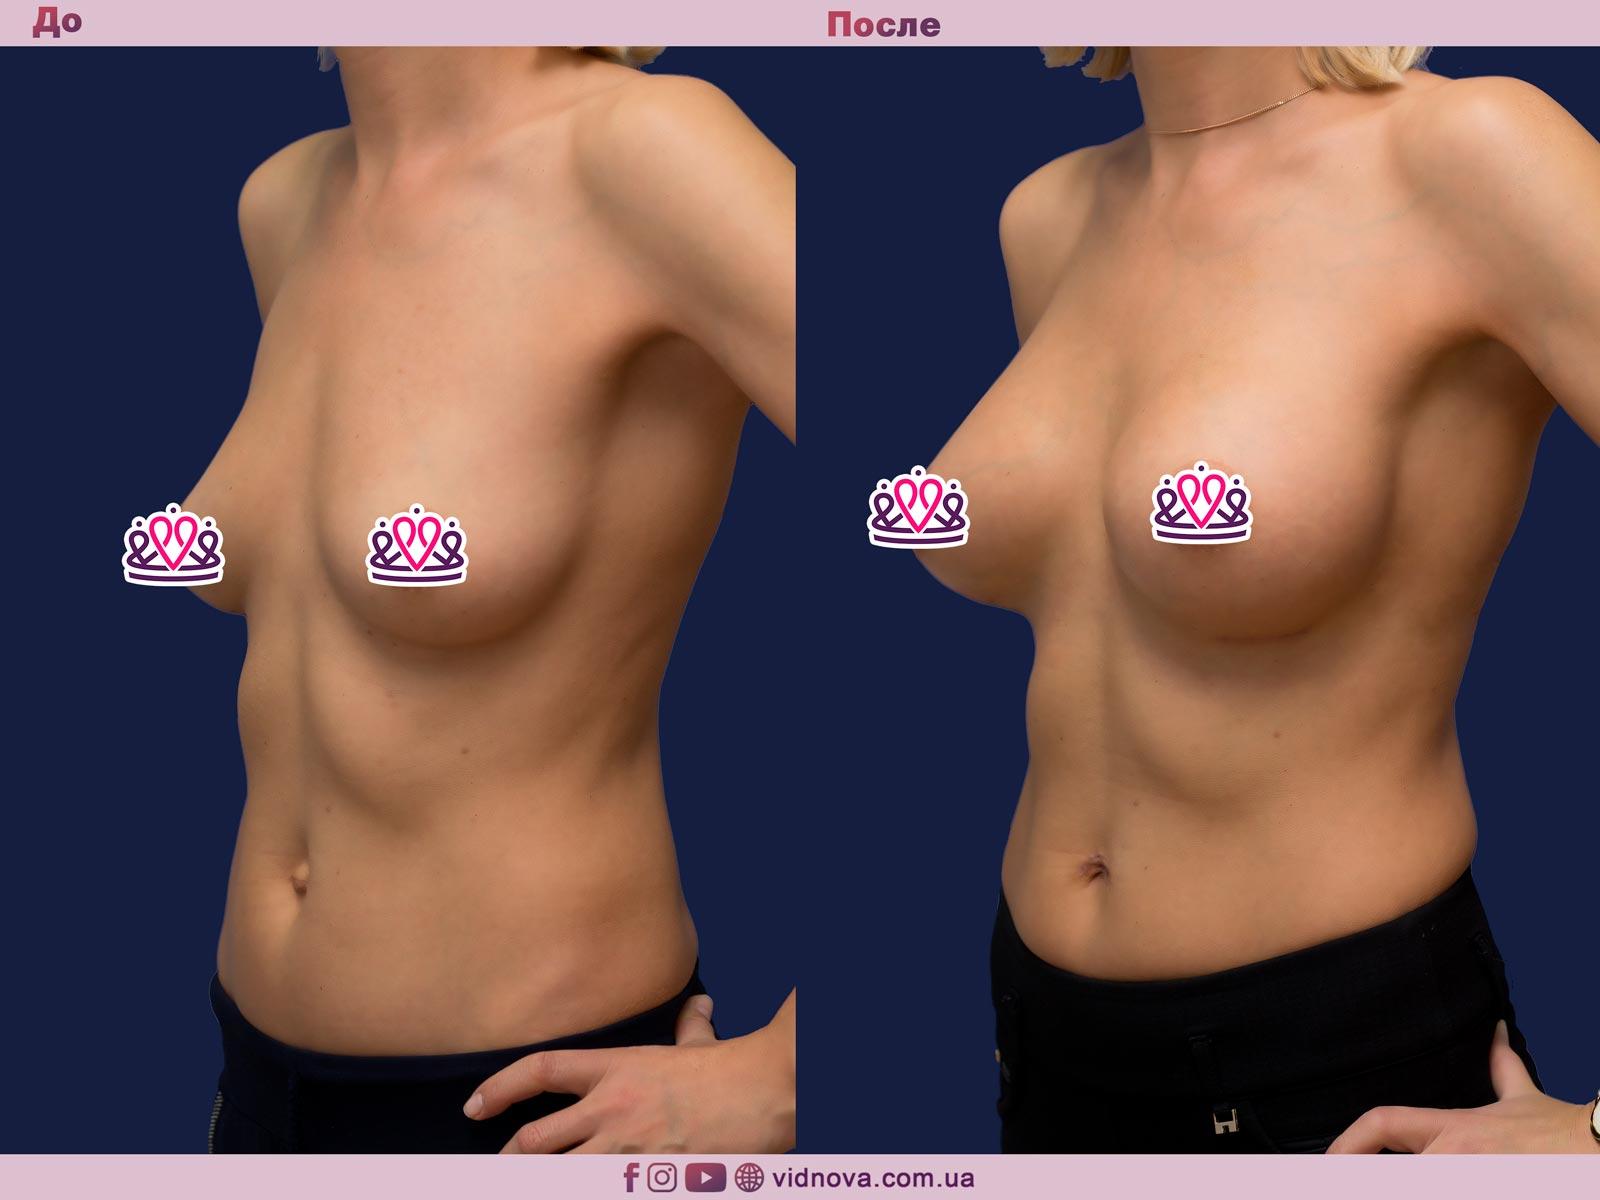 Увеличение груди: Фото ДО и ПОСЛЕ - Пример №75-2 - Клиника Vidnova